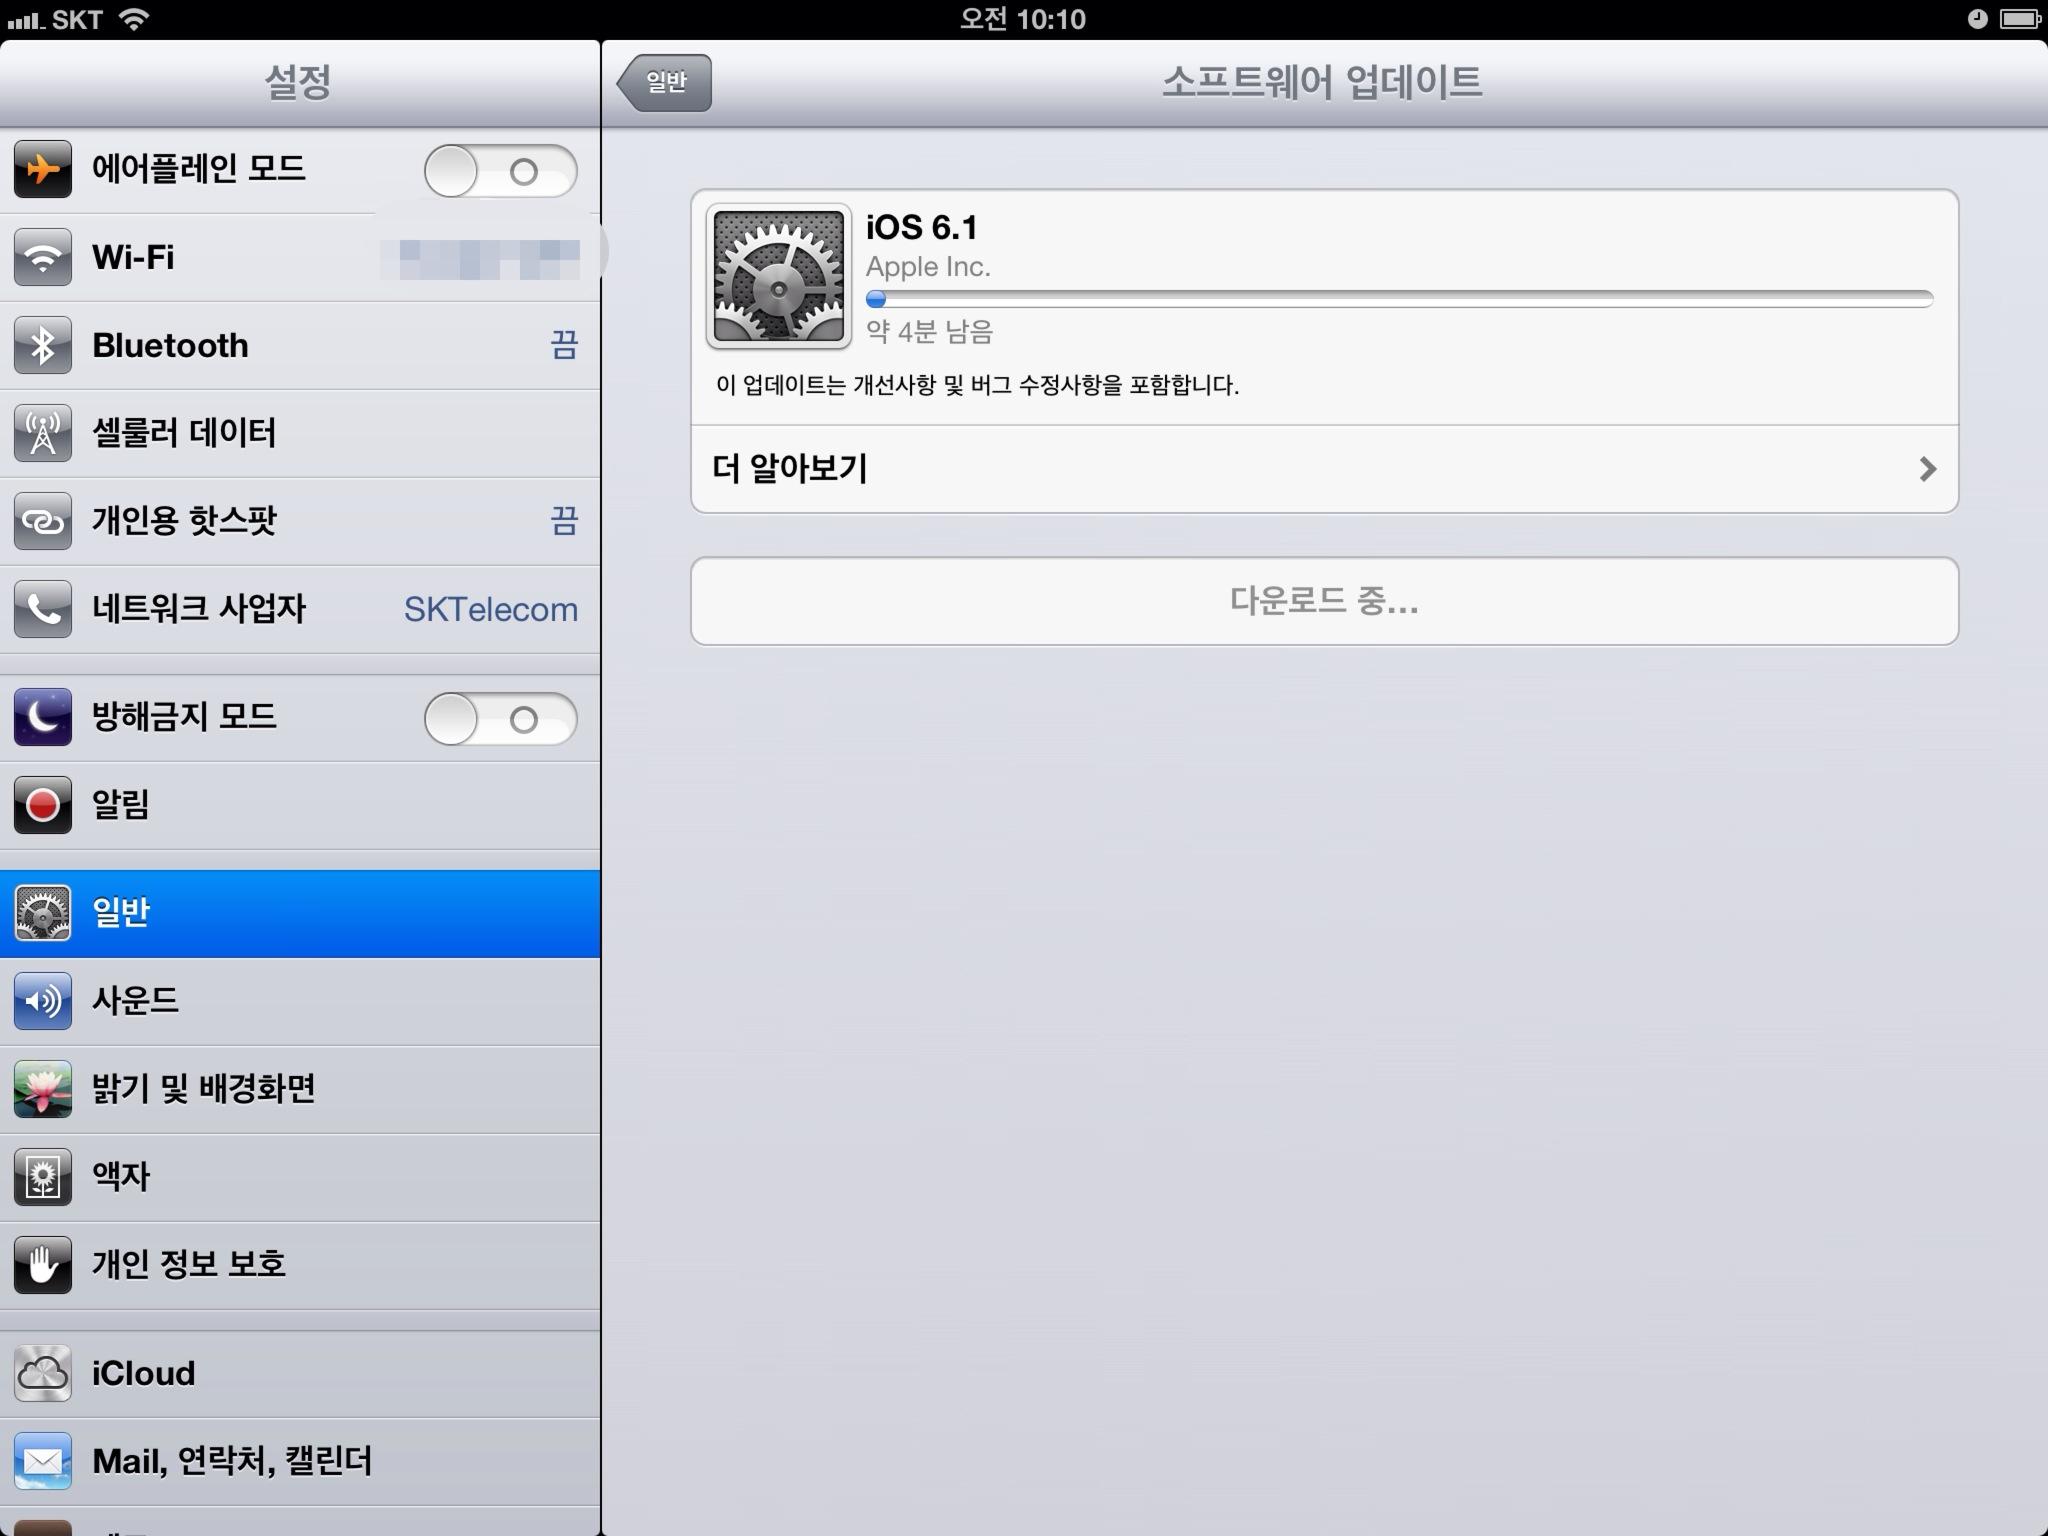 iPad iOS 6.1 Update